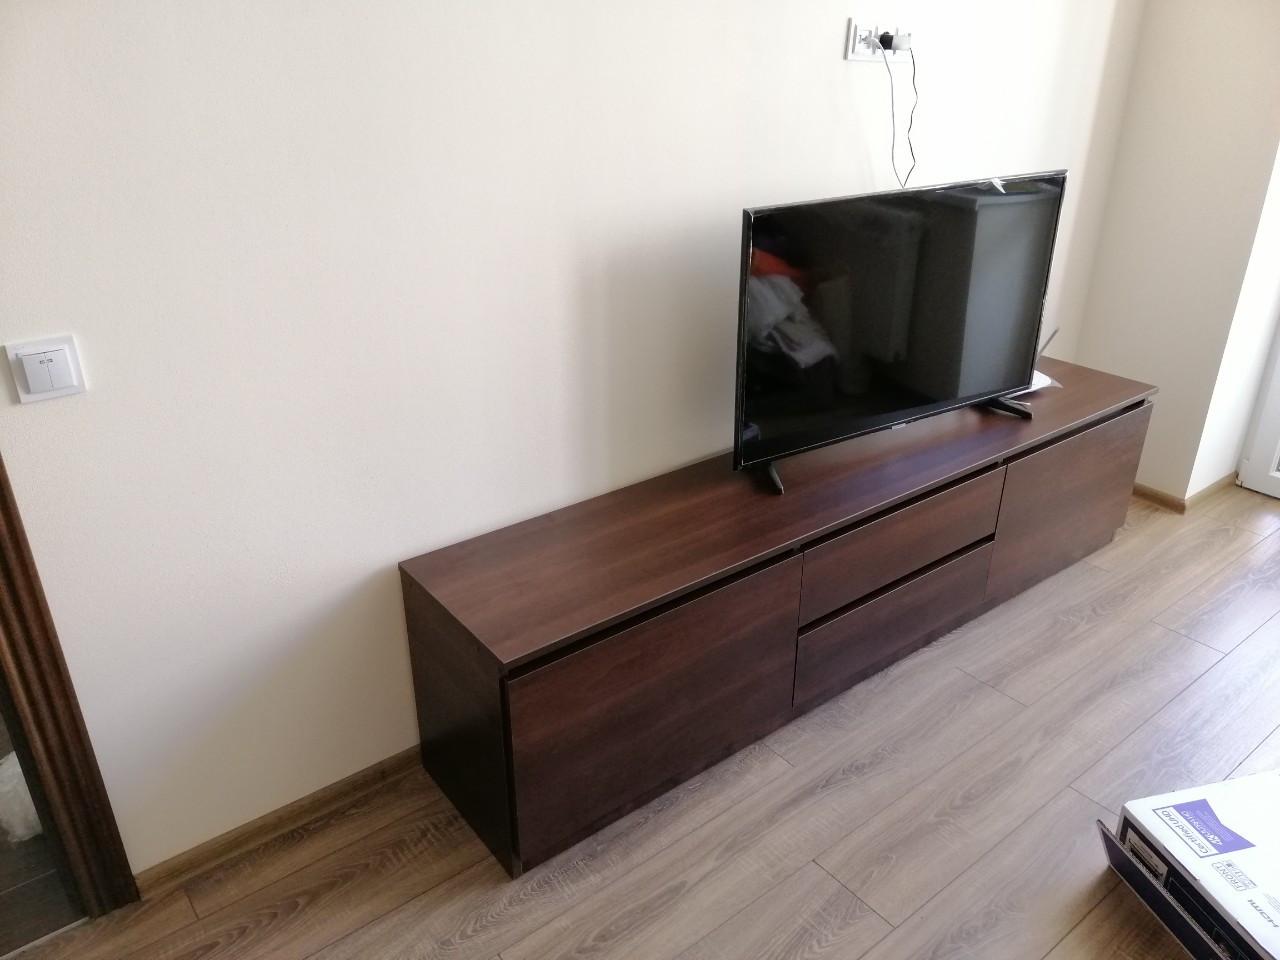 Тумба ТВ из ДСП